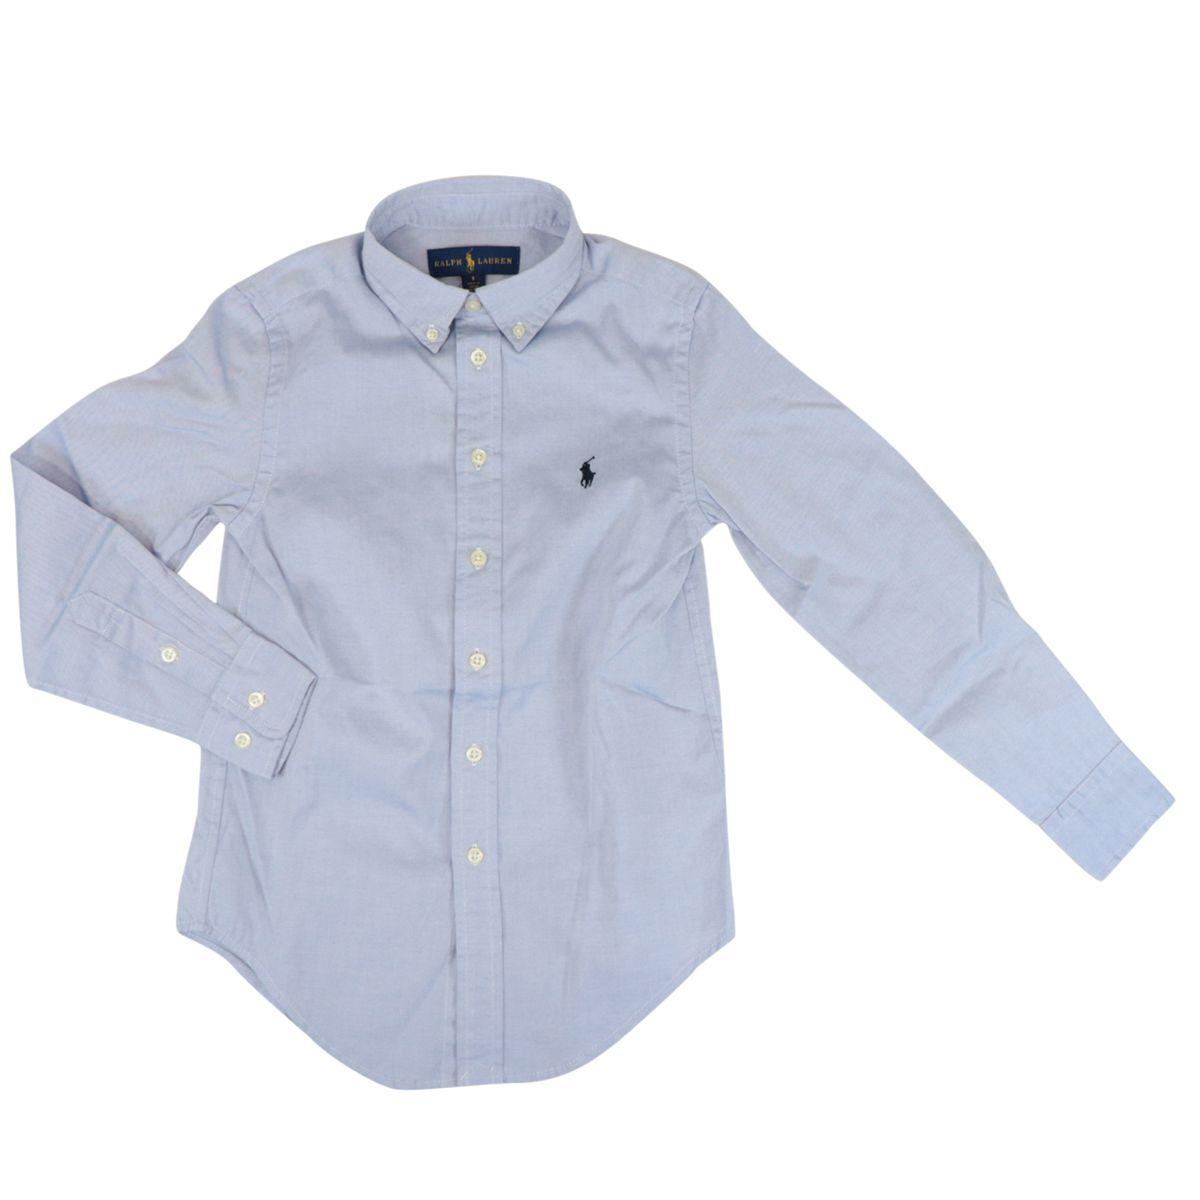 Cotton shirt with botton down collar Oxford blue Polo Ralph Lauren